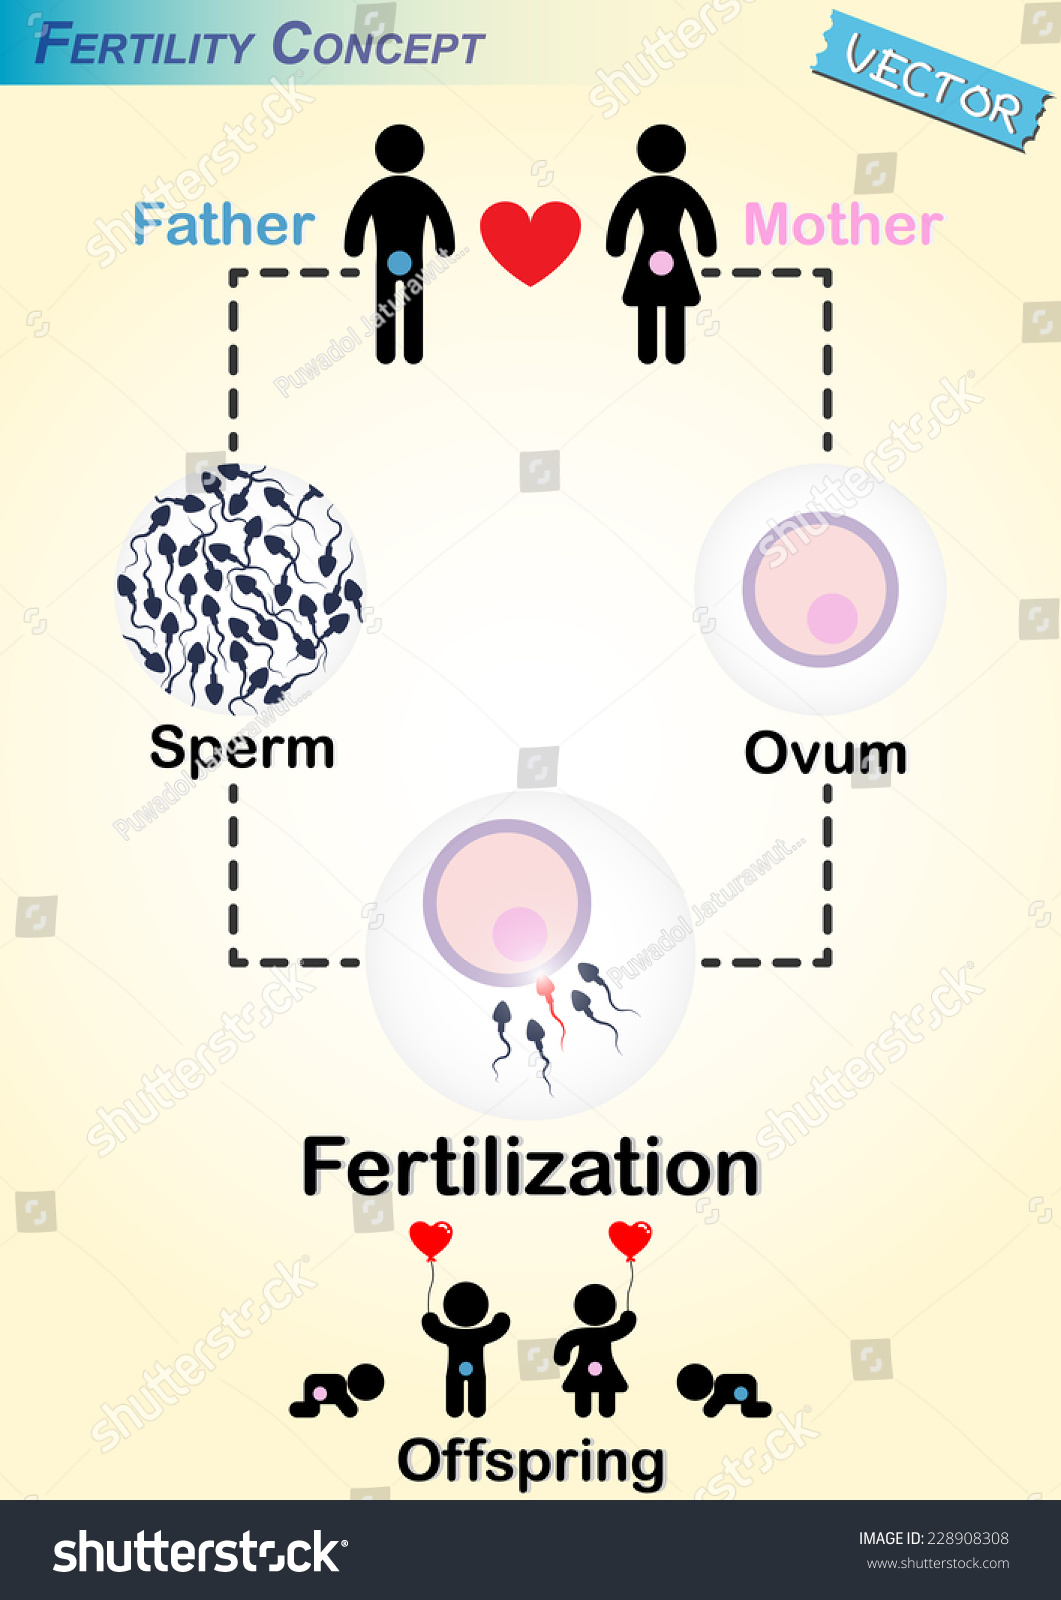 Delightful facial sperm flow - 3 1